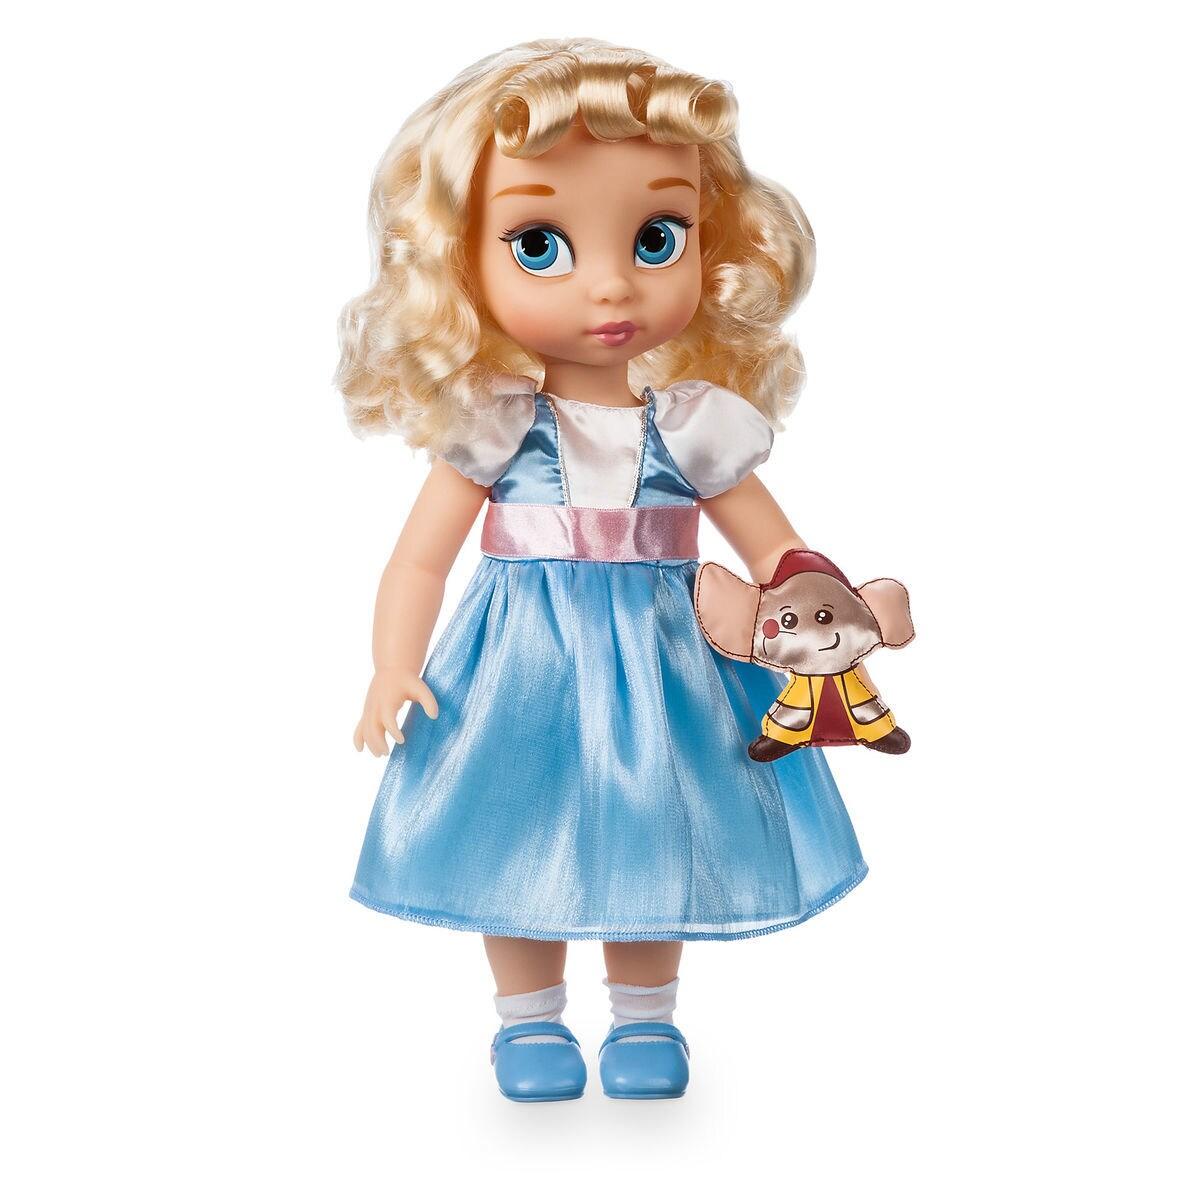 Disney animators collection cinderella doll 16 shopdisney product image of disney animators collection cinderella doll 16 1 altavistaventures Image collections